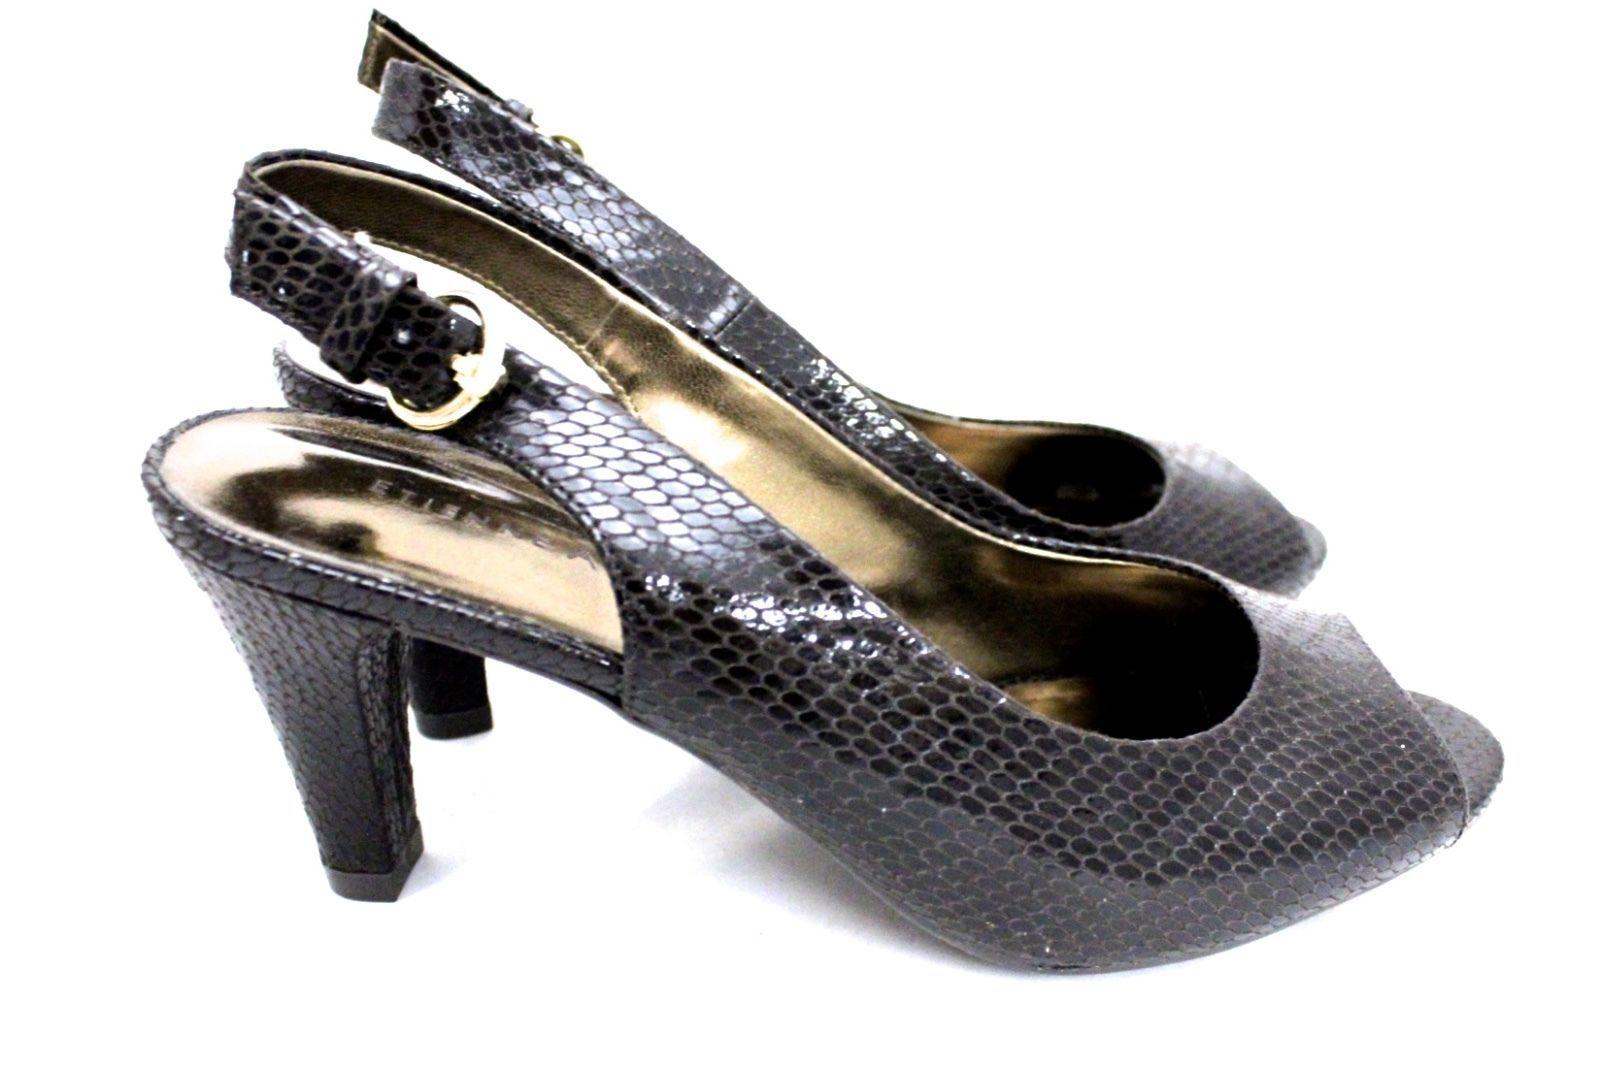 Etienne Aigner Marbella Women's 7 M Brown Faux Snakeskin Slingback Shoes NIB - $19.72